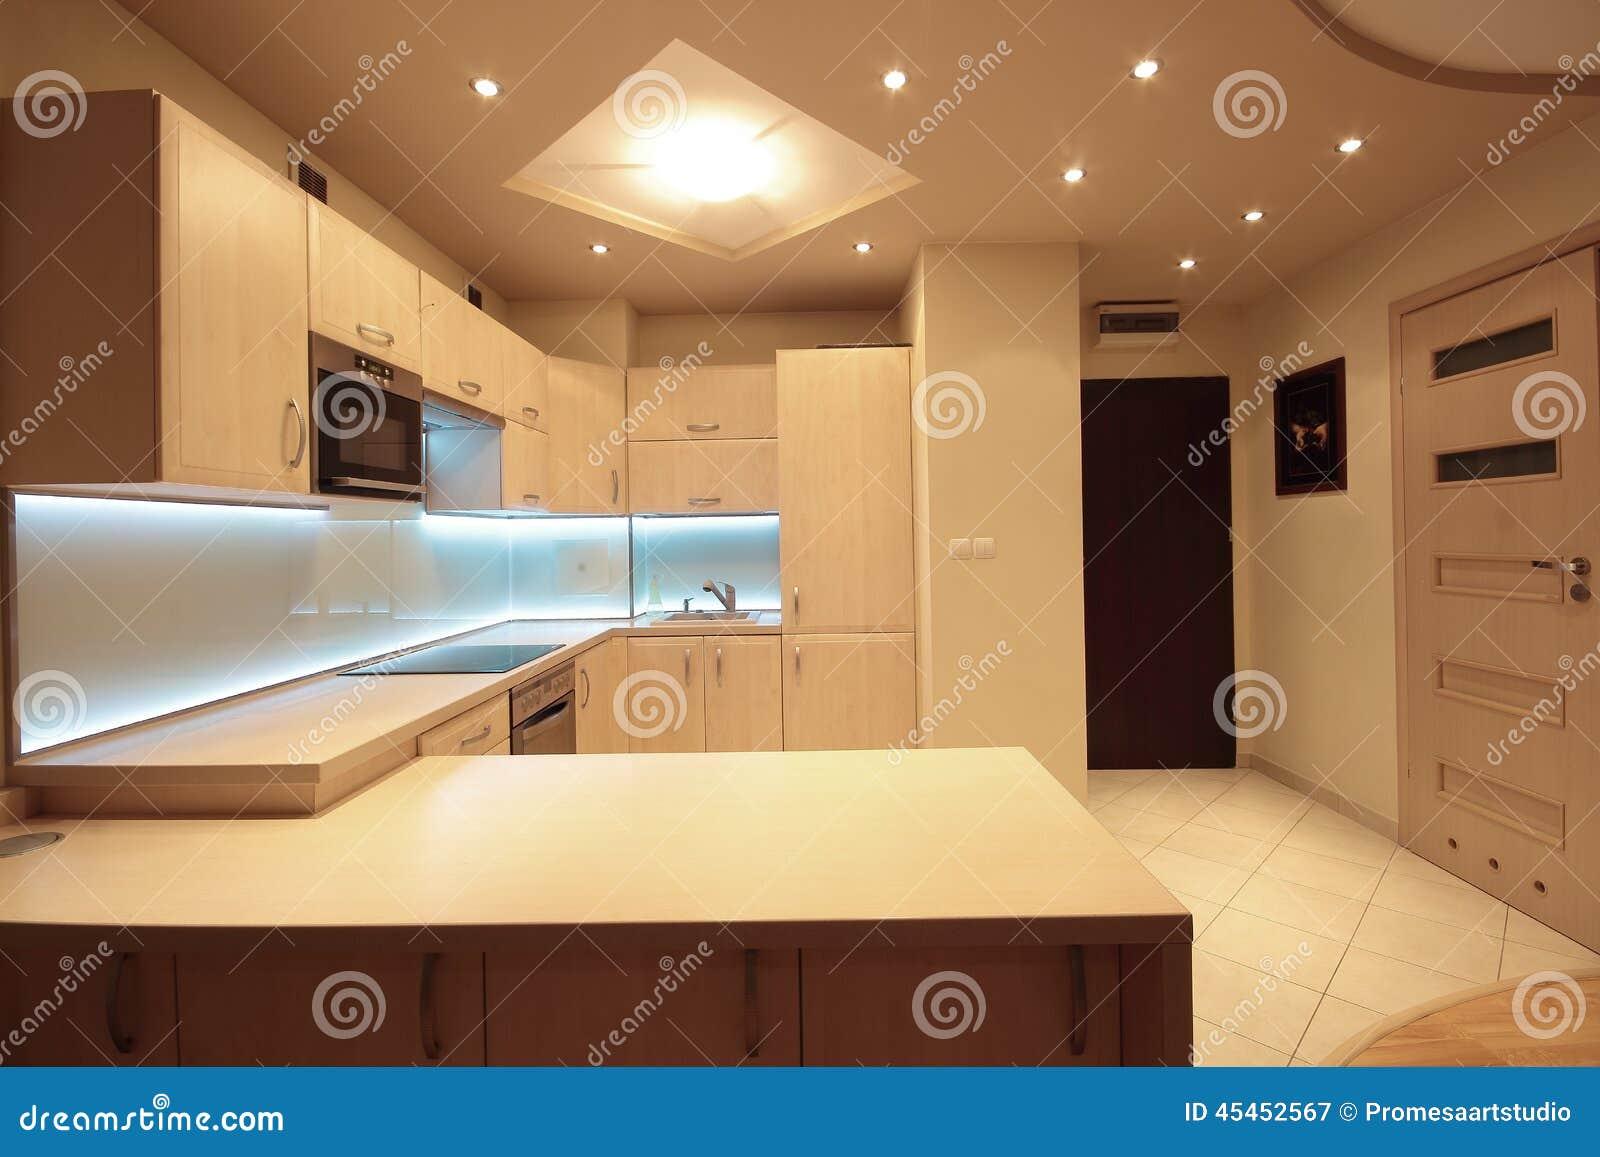 Cucina di lusso moderna con illuminazione bianca del led for Led per cucina